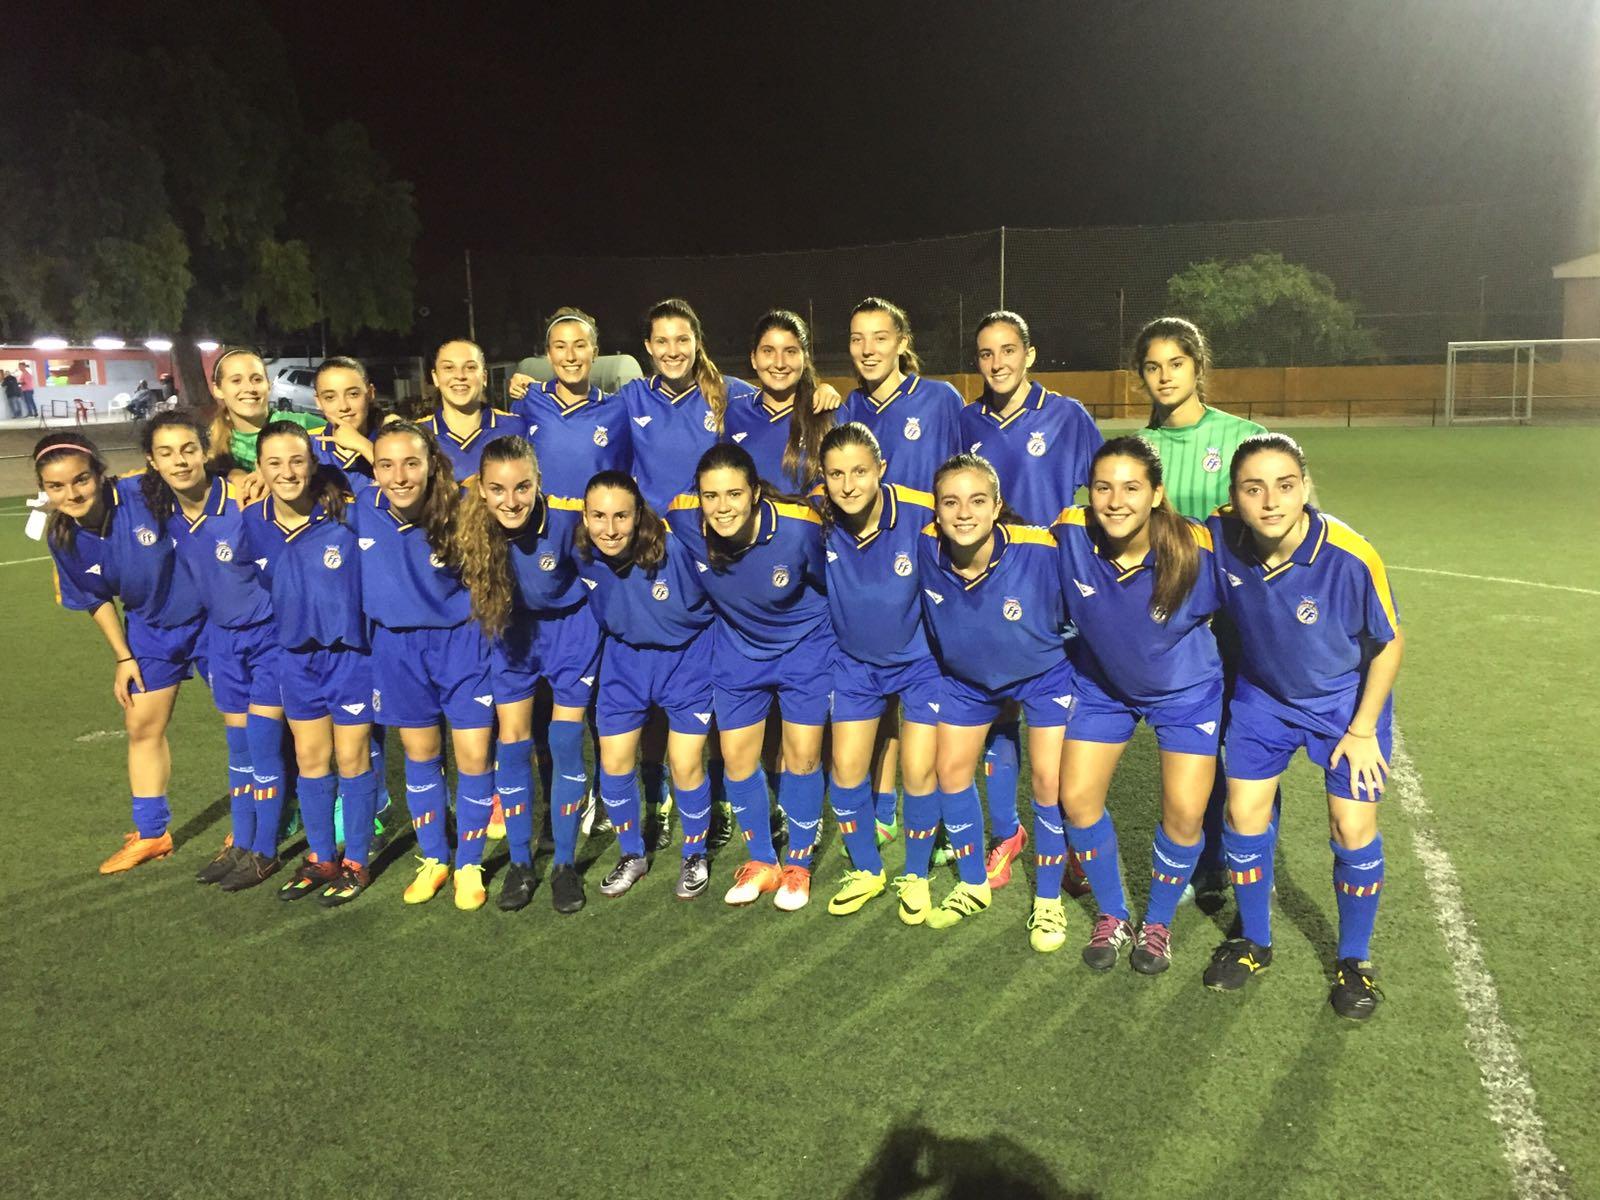 Convocatoria para la selecci n femenina sub 18 ffcv for Federacion valenciana de futbol